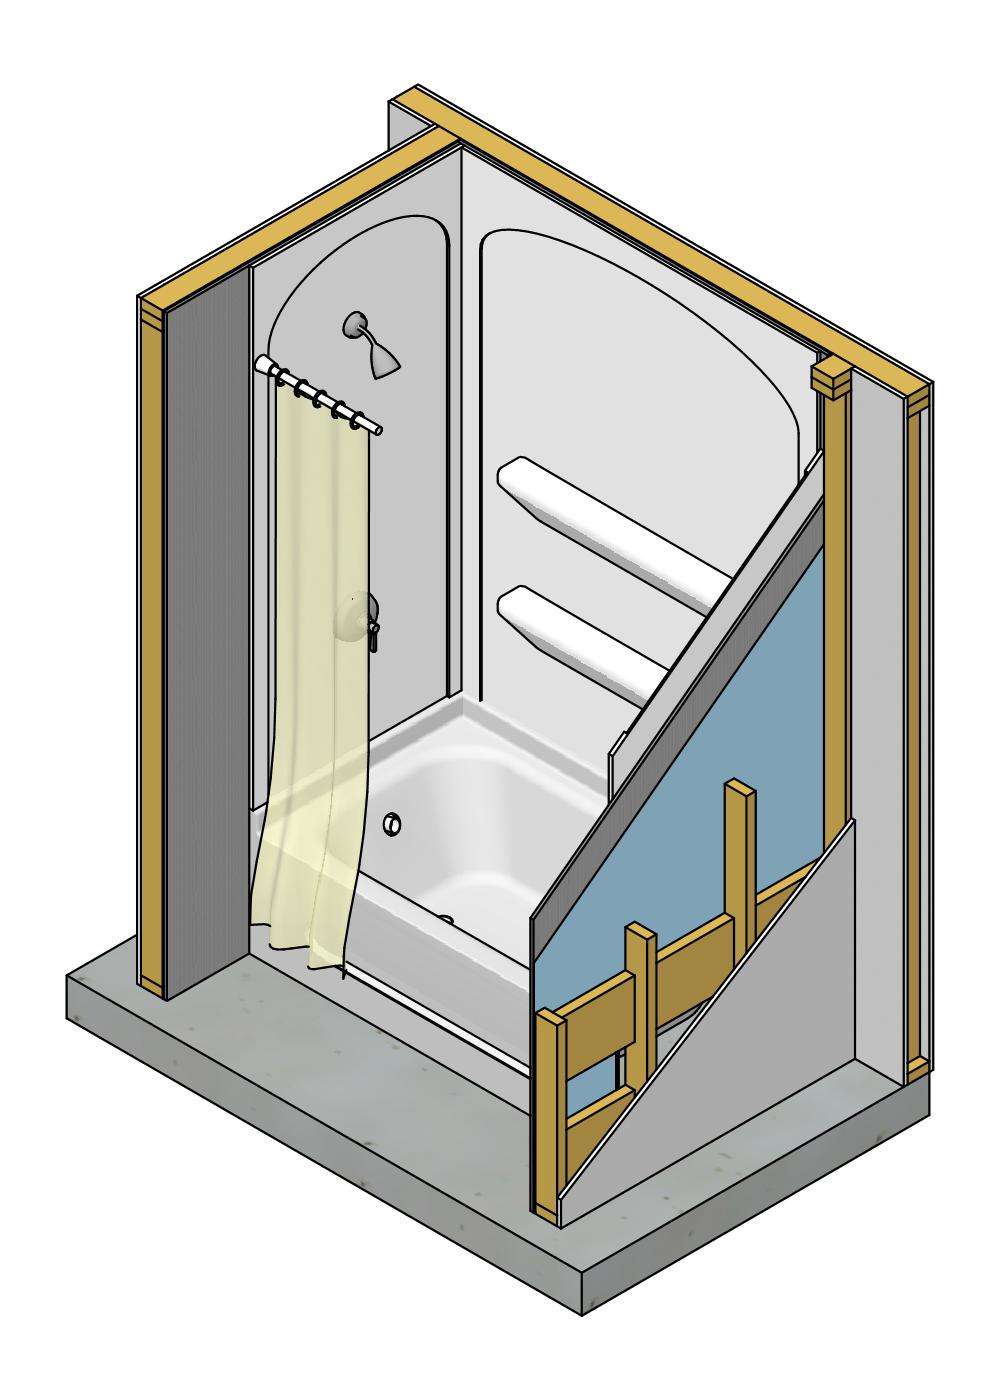 peerless tub surround installation instructions